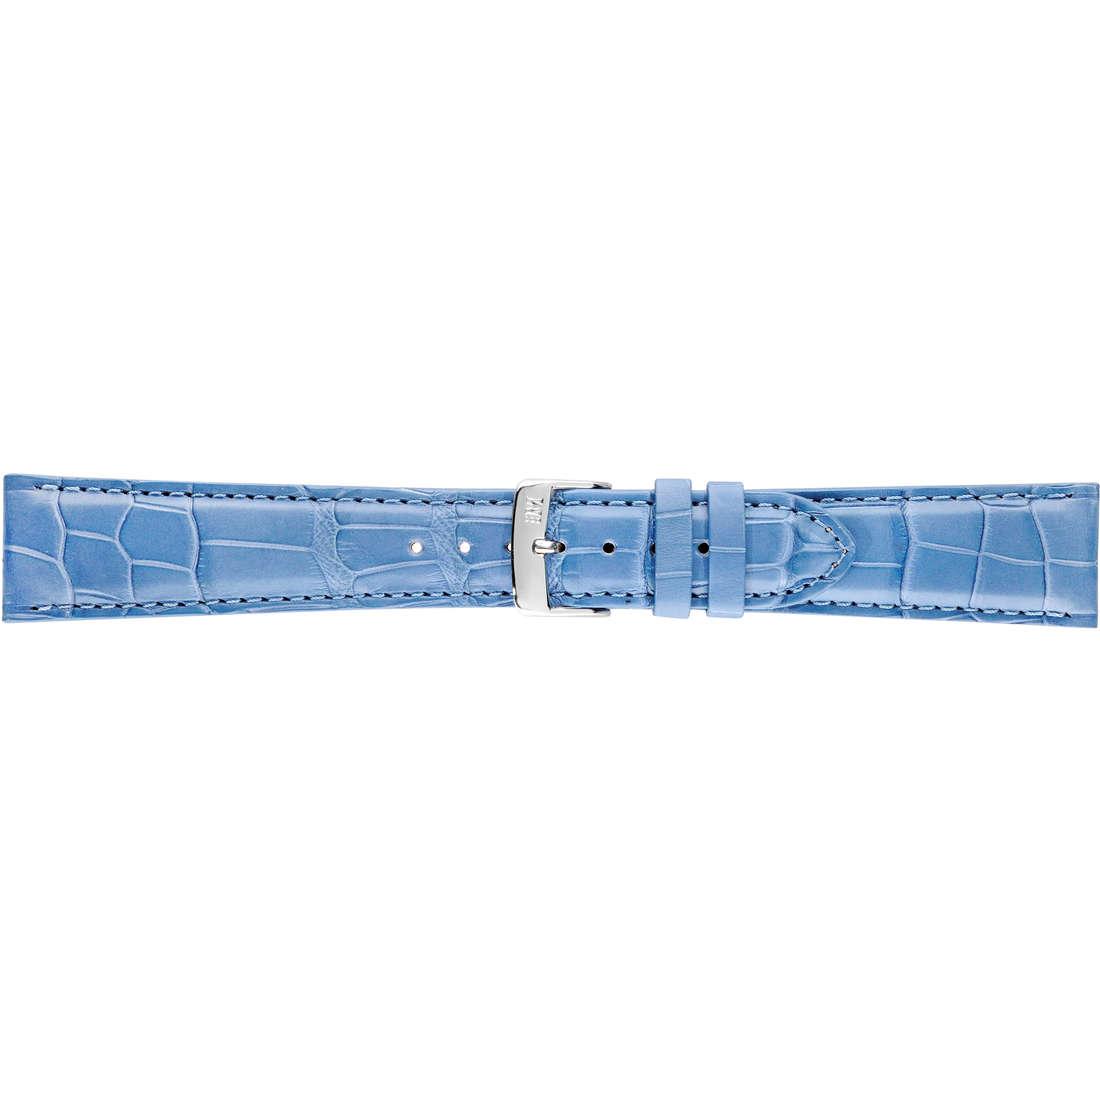 watch watch bands watch straps man Morellato Pelli Preziose A01U0518339266CR20